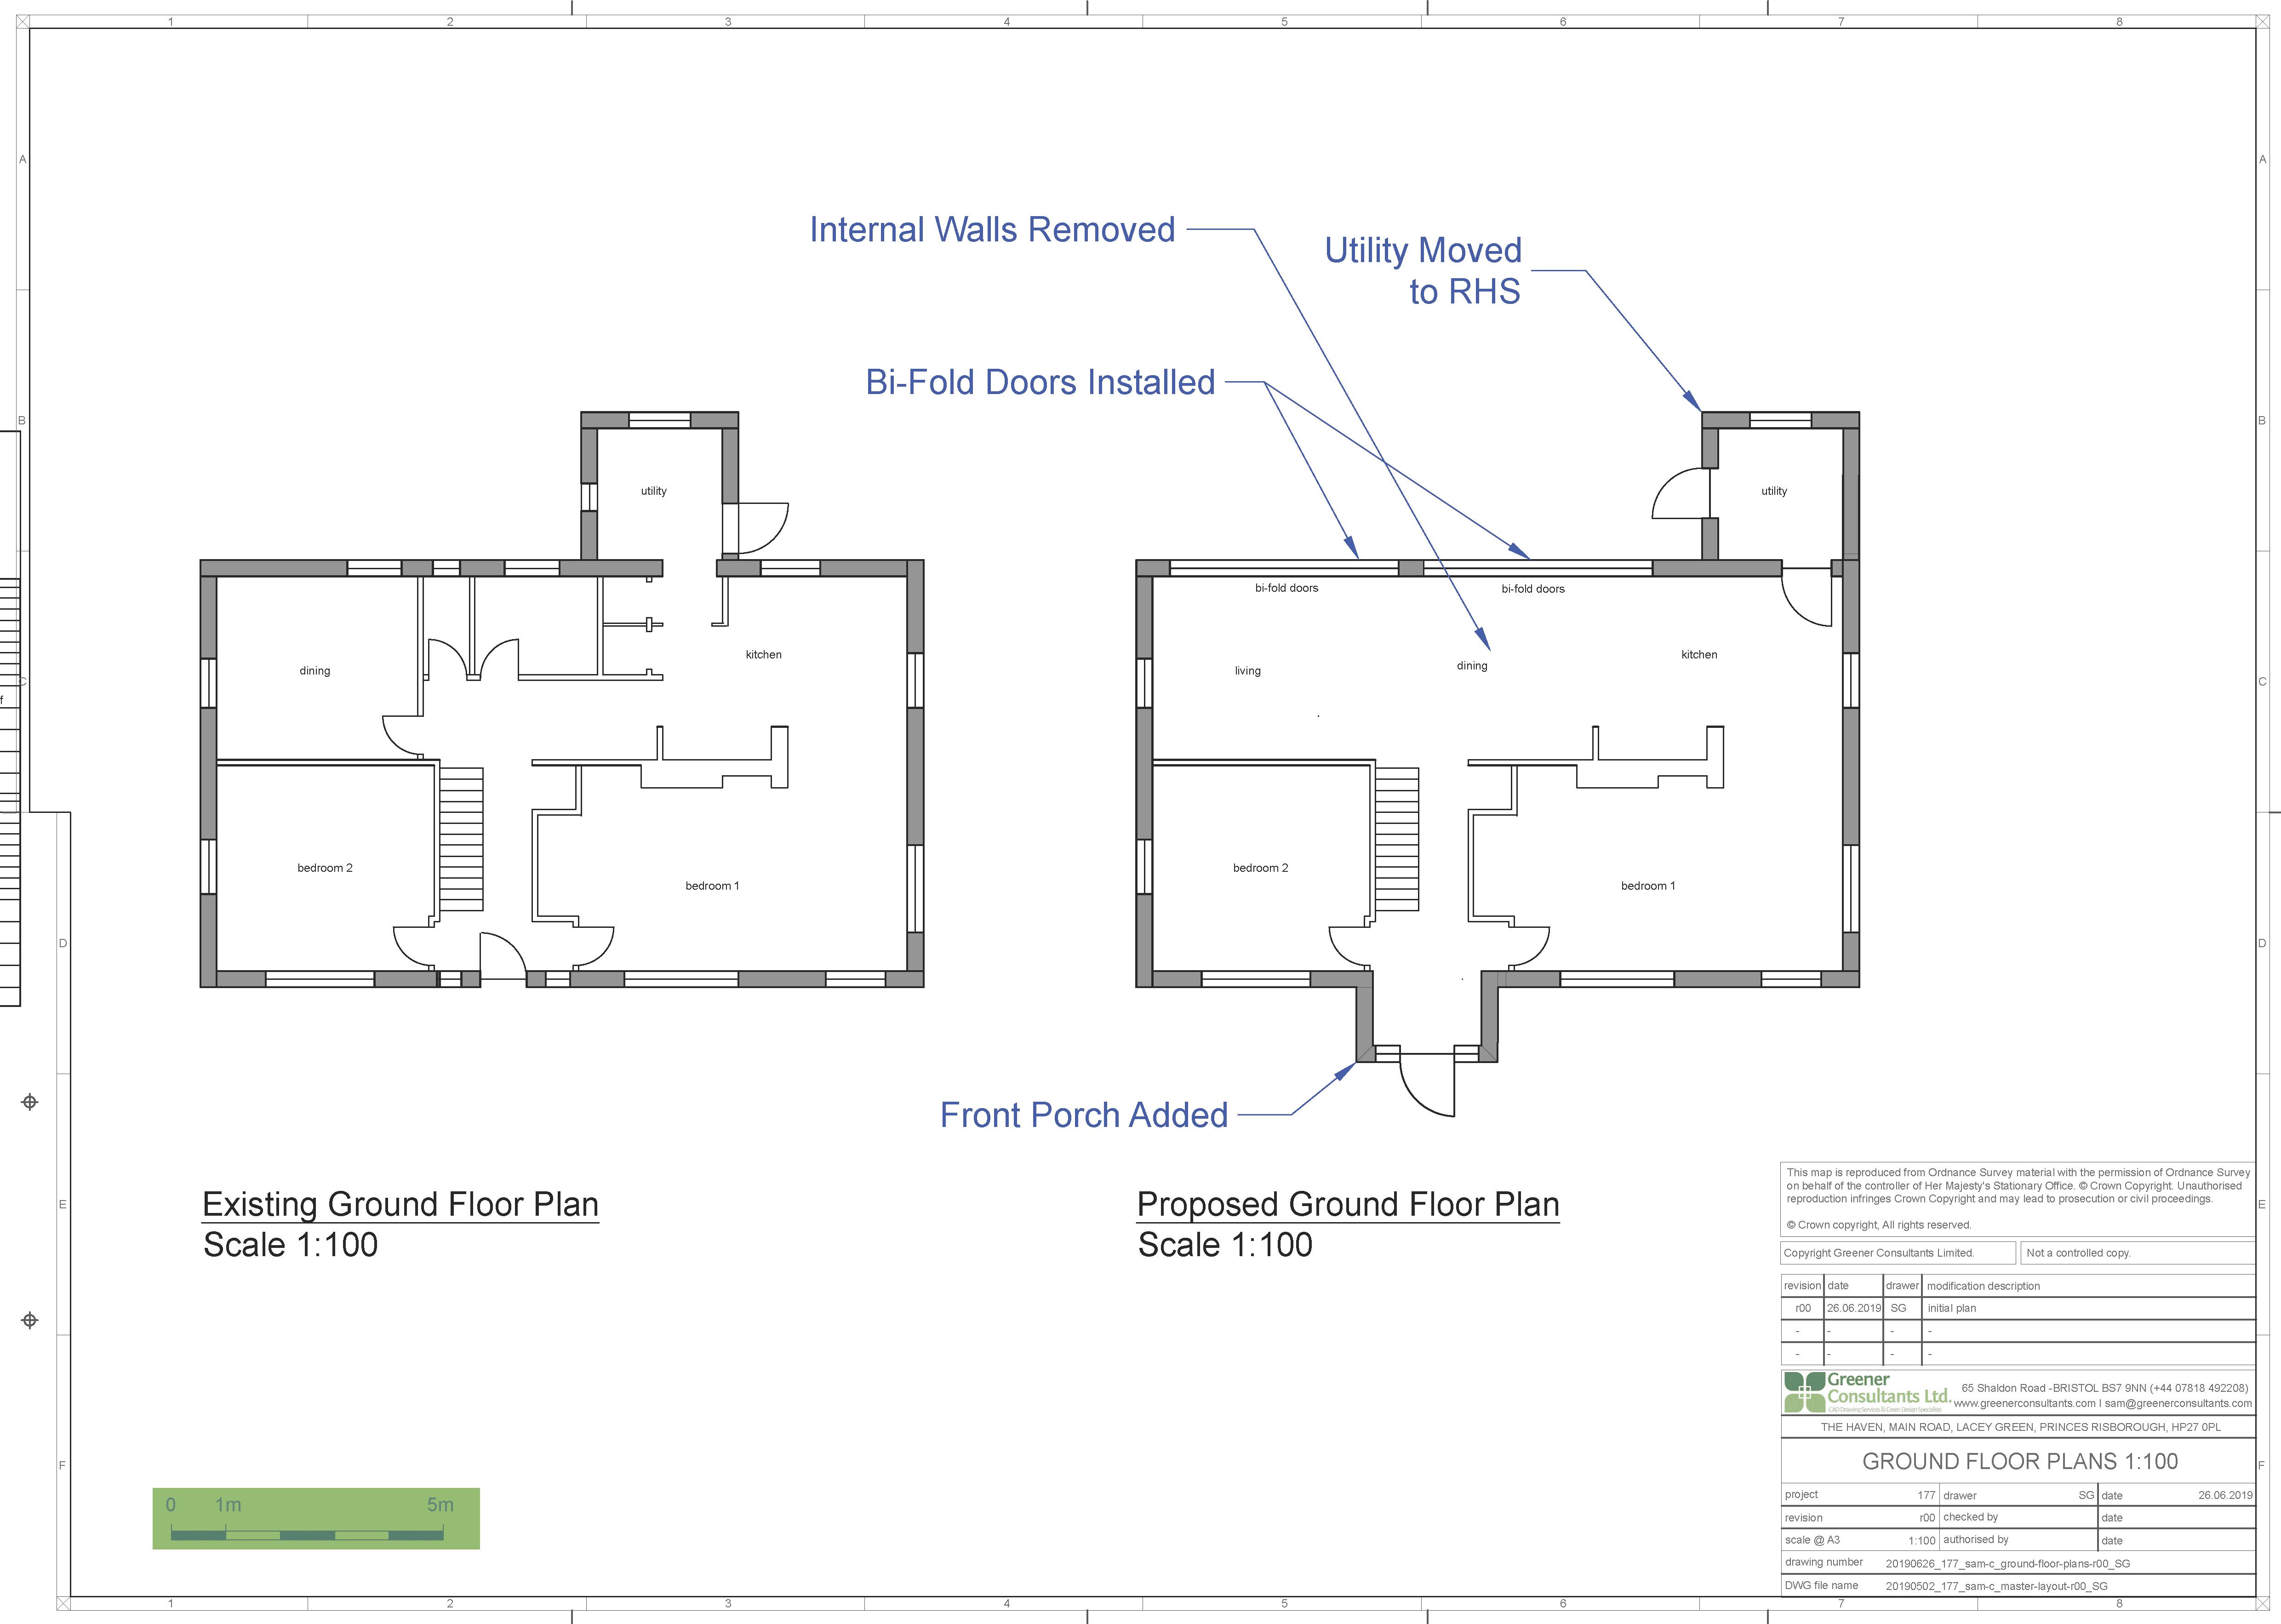 bristol floor plans, buckinghamshire floor plans, building amendments, extensions